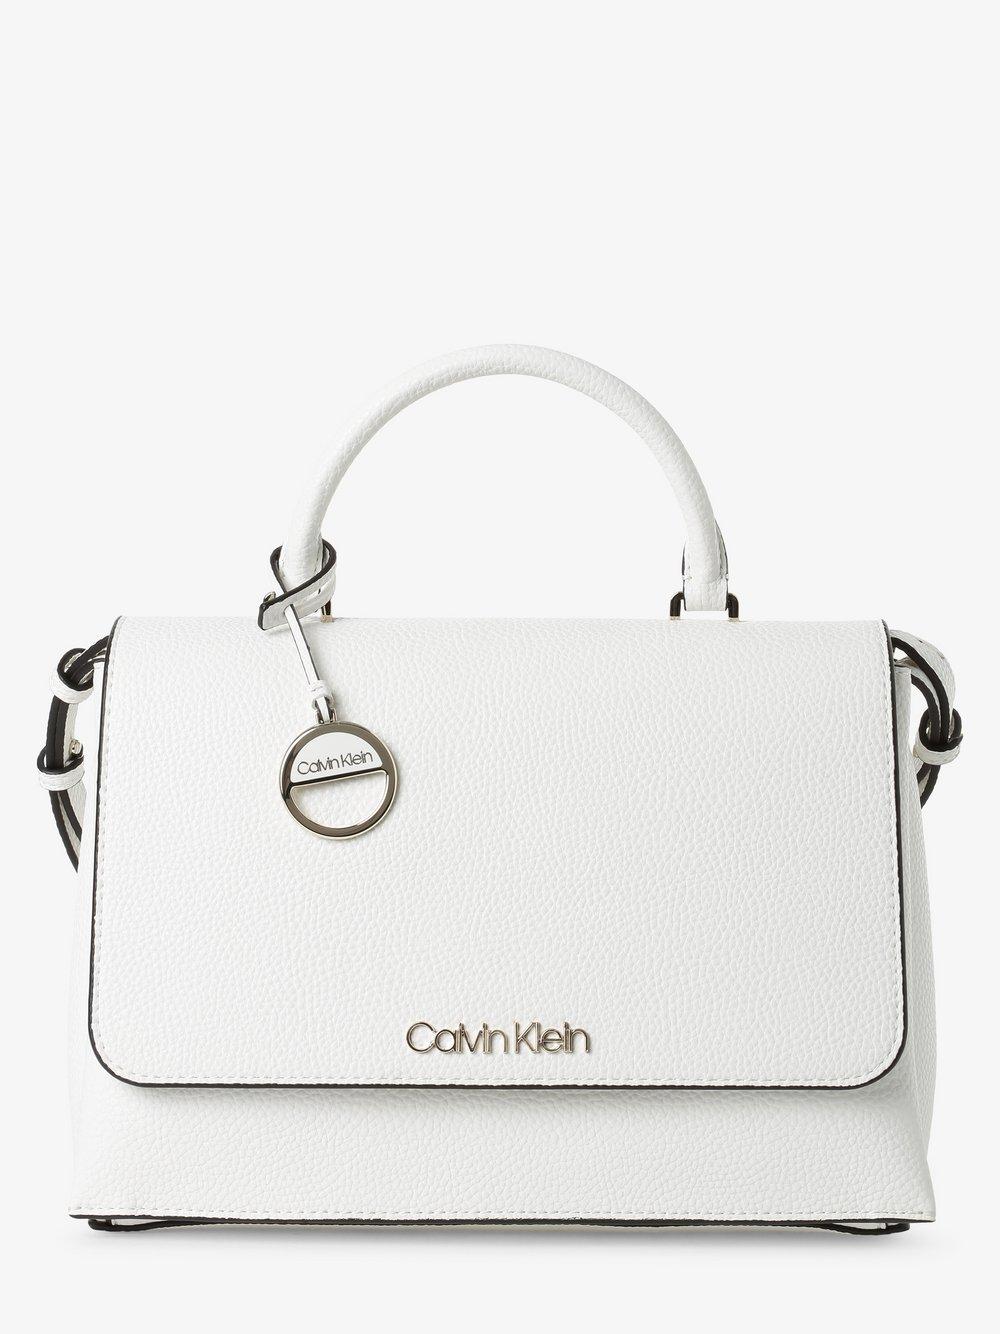 Calvin Klein - Torebka damska, biały